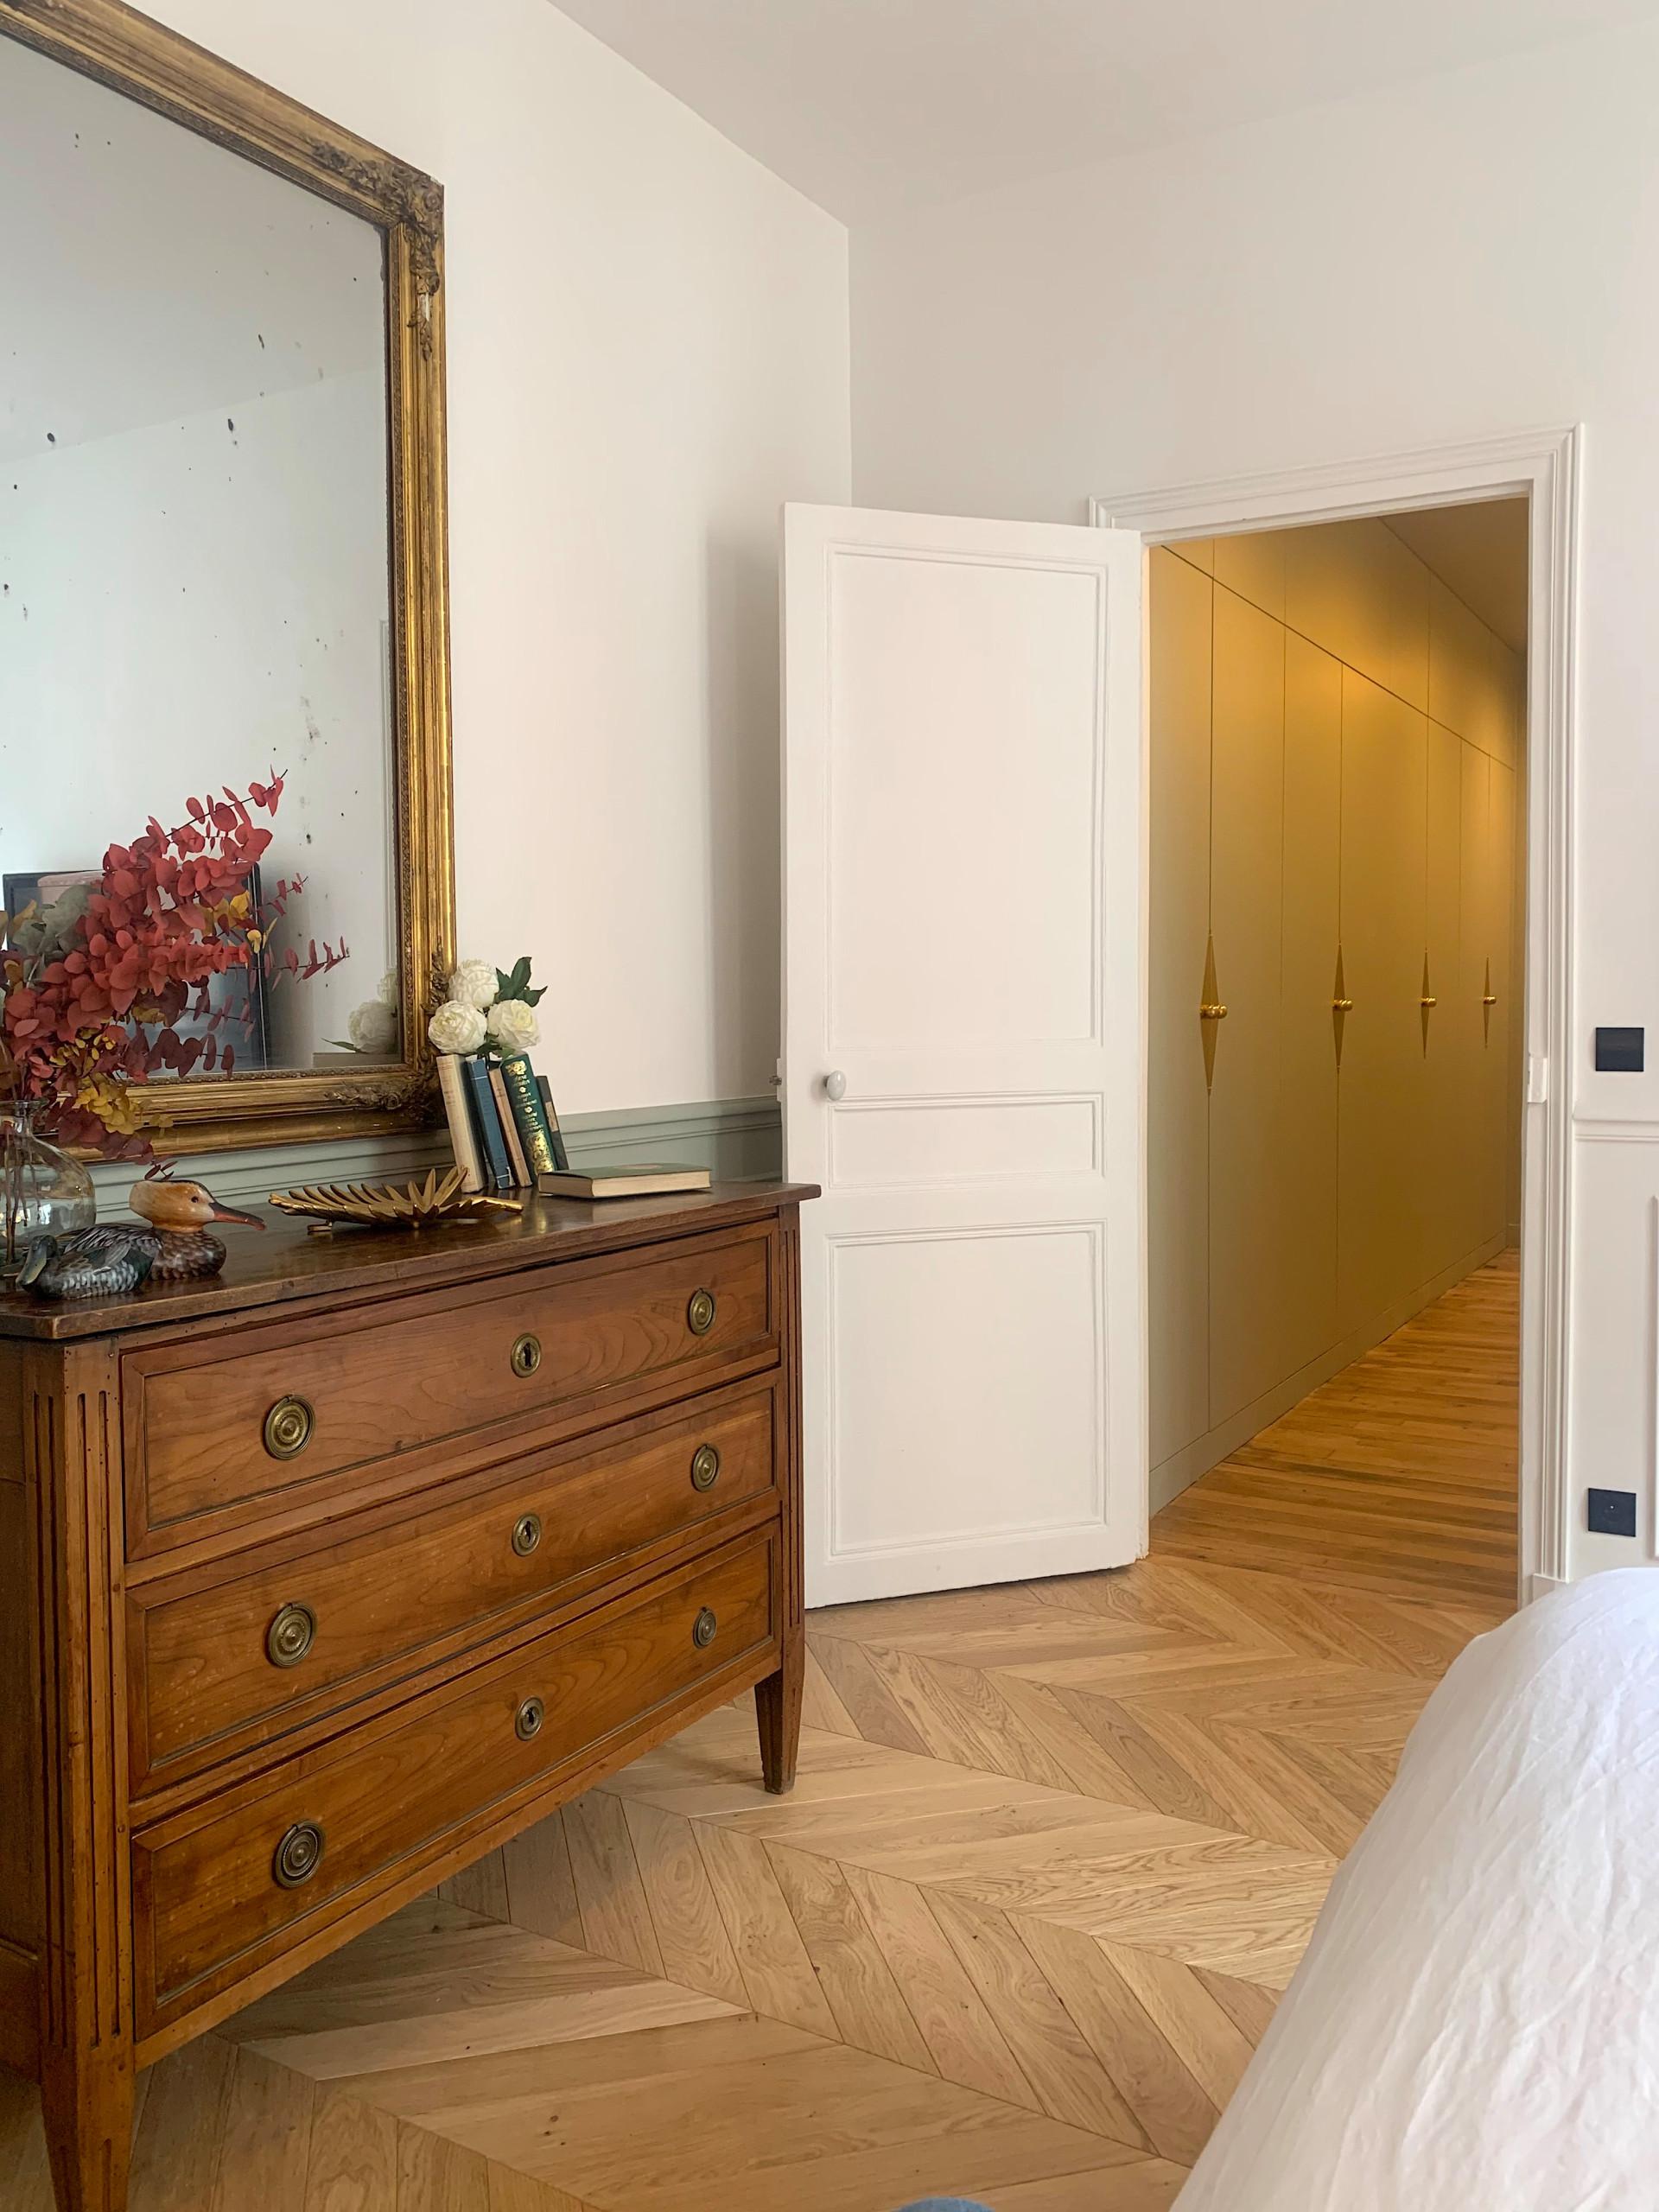 Appartement haussmannien de 150m2